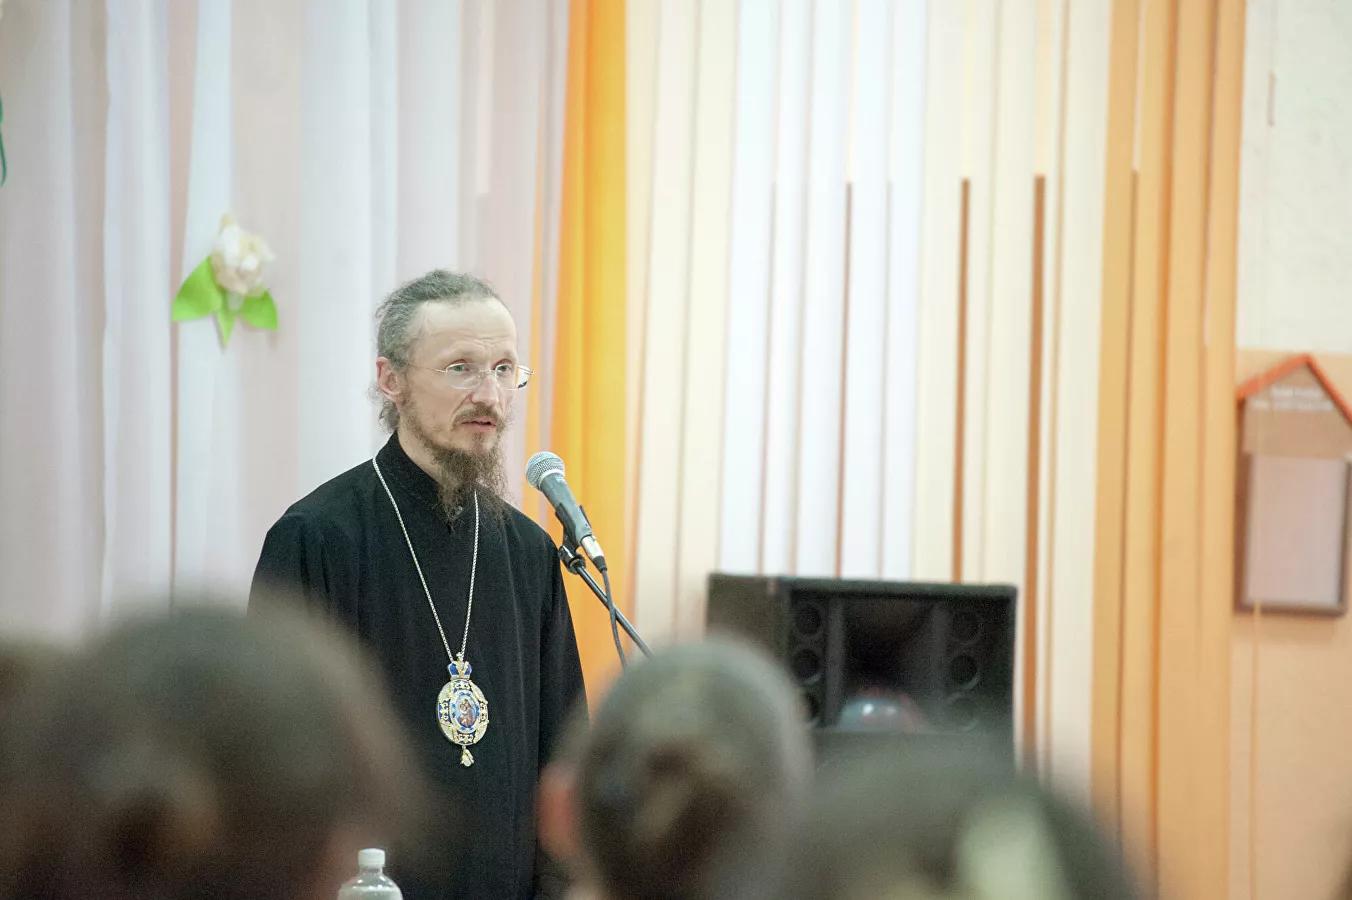 Епископ Борисовский и Марьингорский Вениамин.    CC BY-SA 4.0 / Яна Седова /